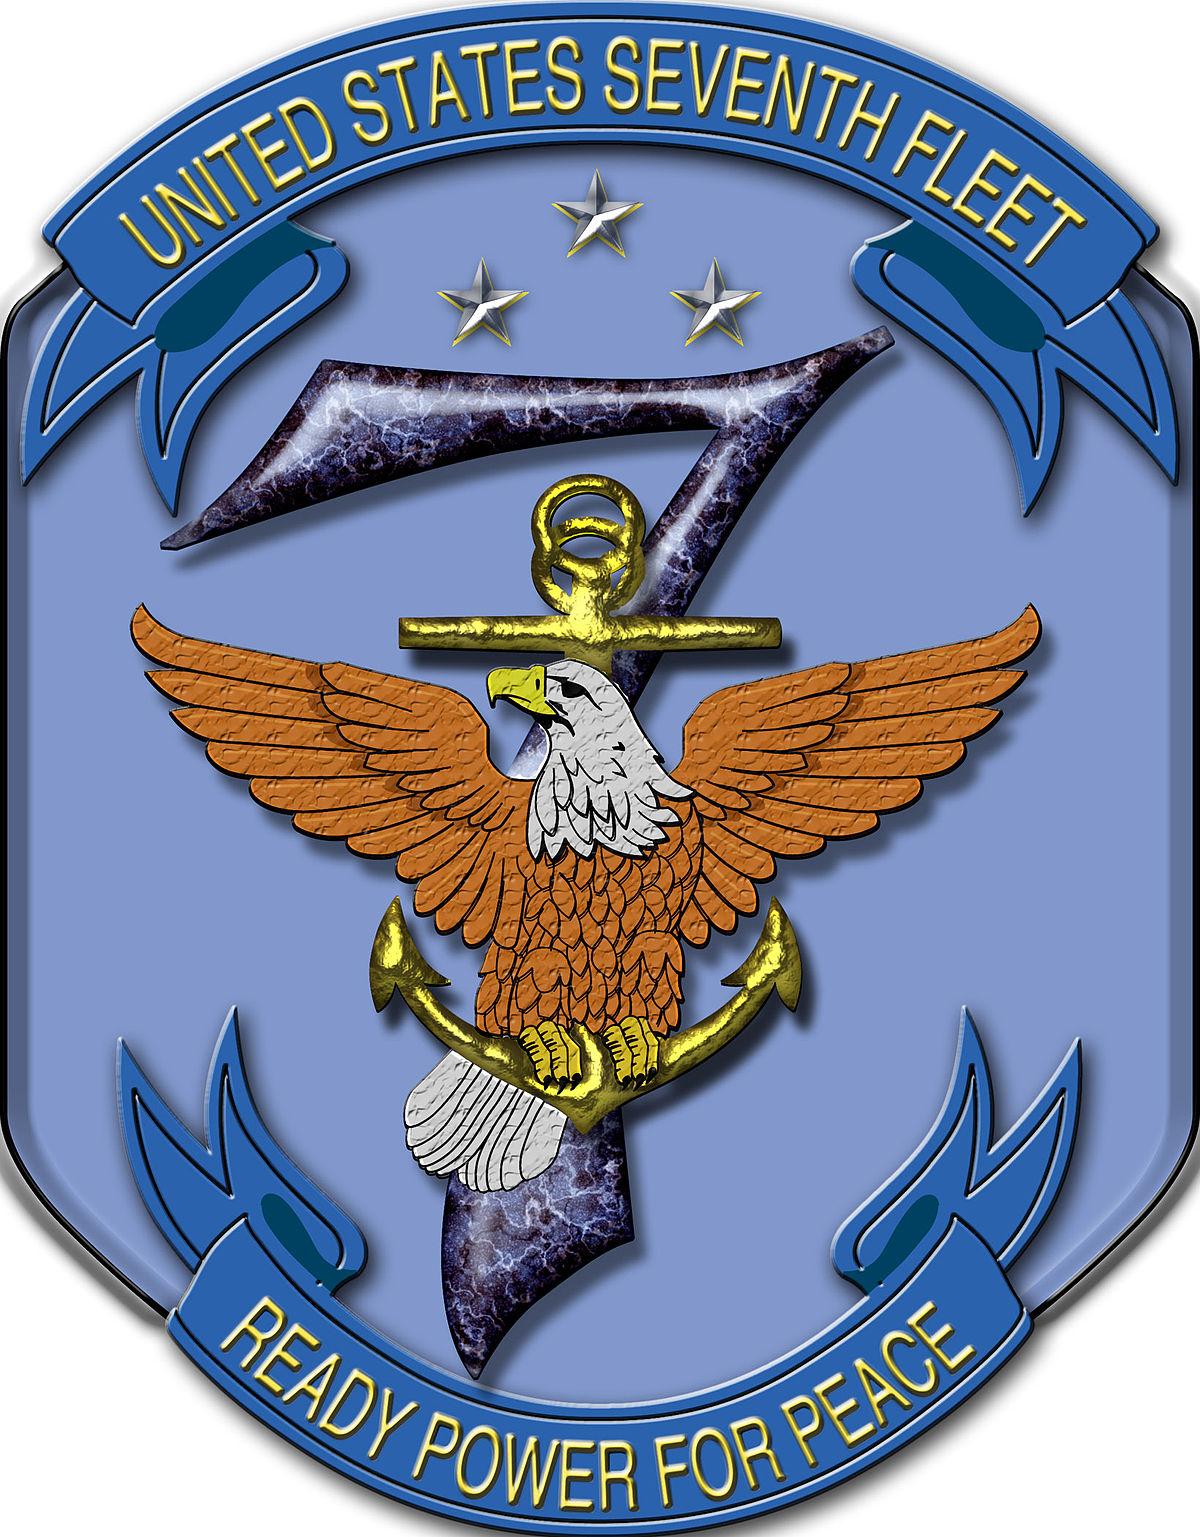 United States Seventh Fleet Wikipedia